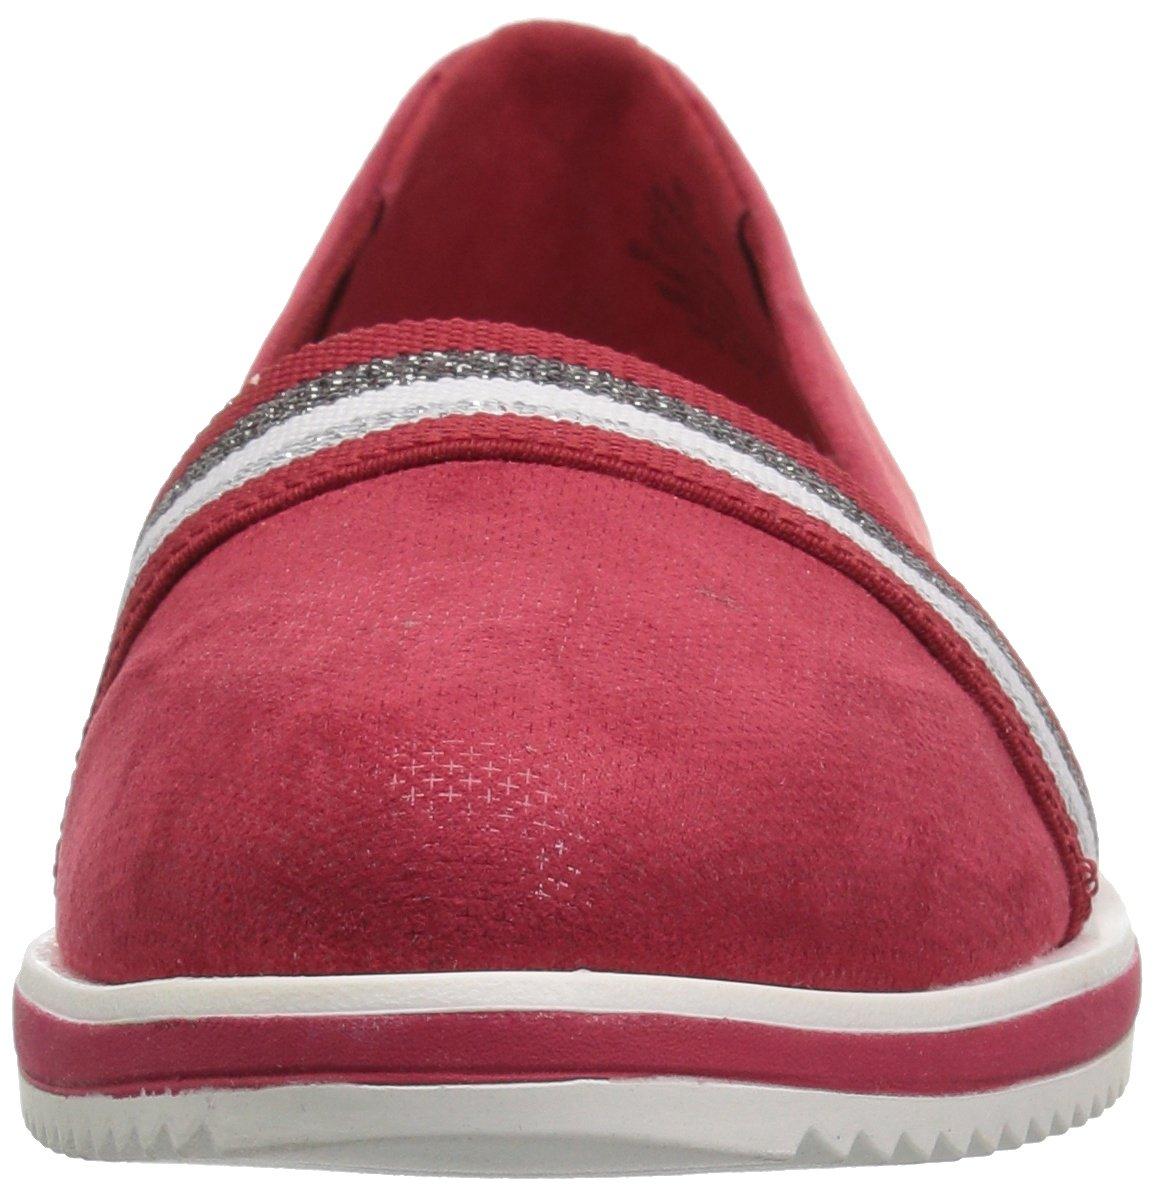 Anne B07BRZBY3R Klein Women's Mallorie Slip Ballet Flat B07BRZBY3R Anne 6.5 B(M) US|Red Fabric fd45c9